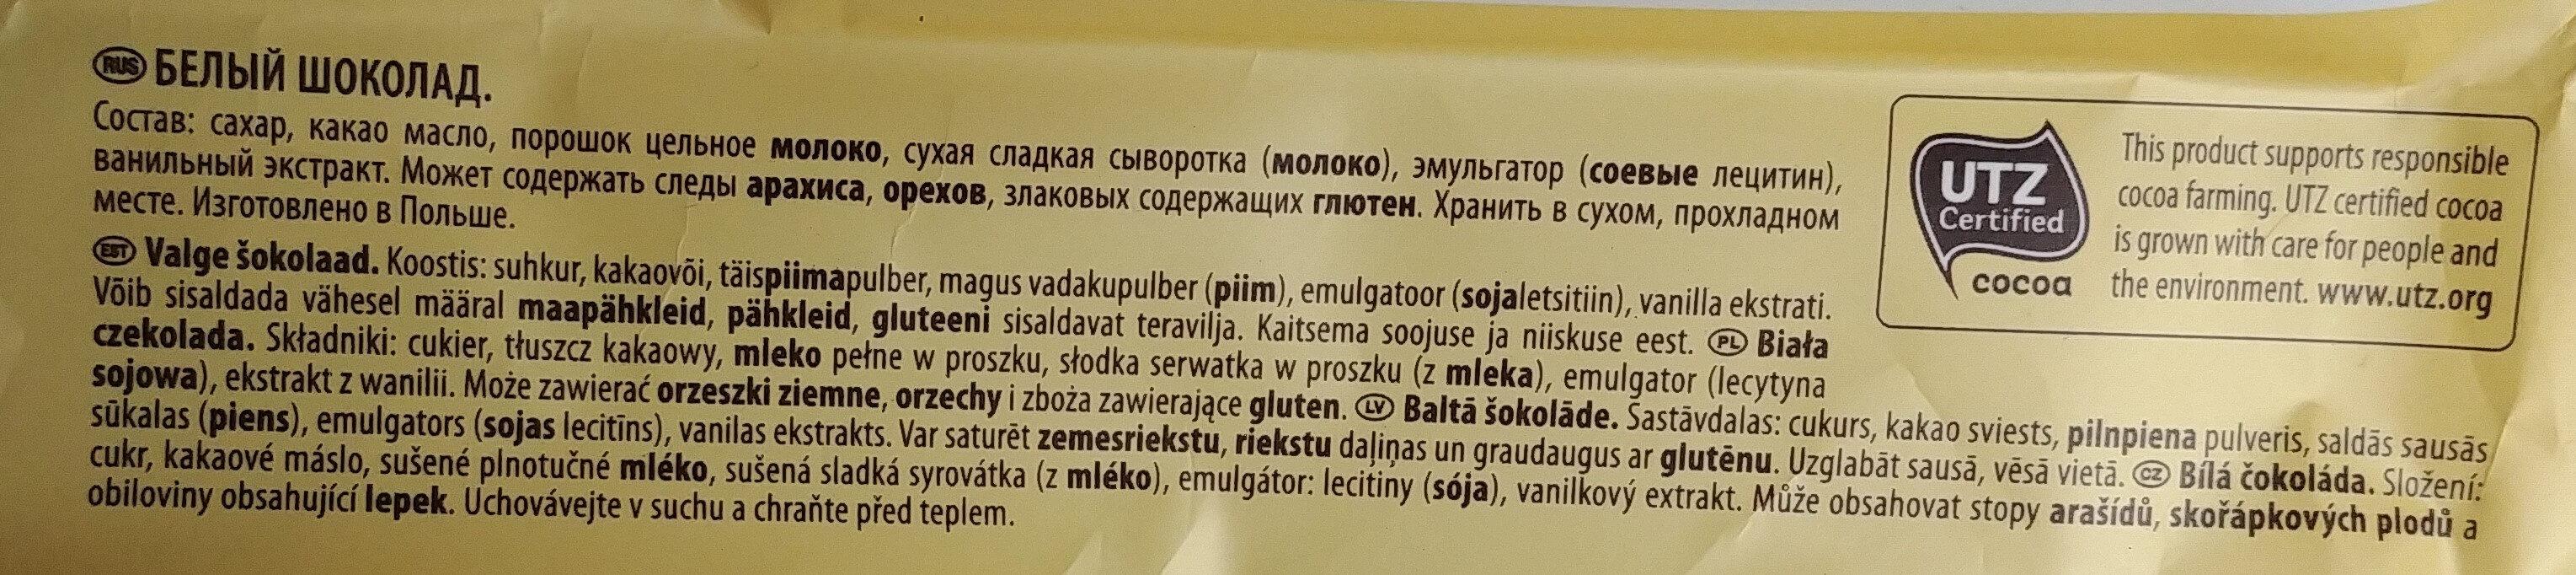 Biała czekolada - Ингредиенты - pl